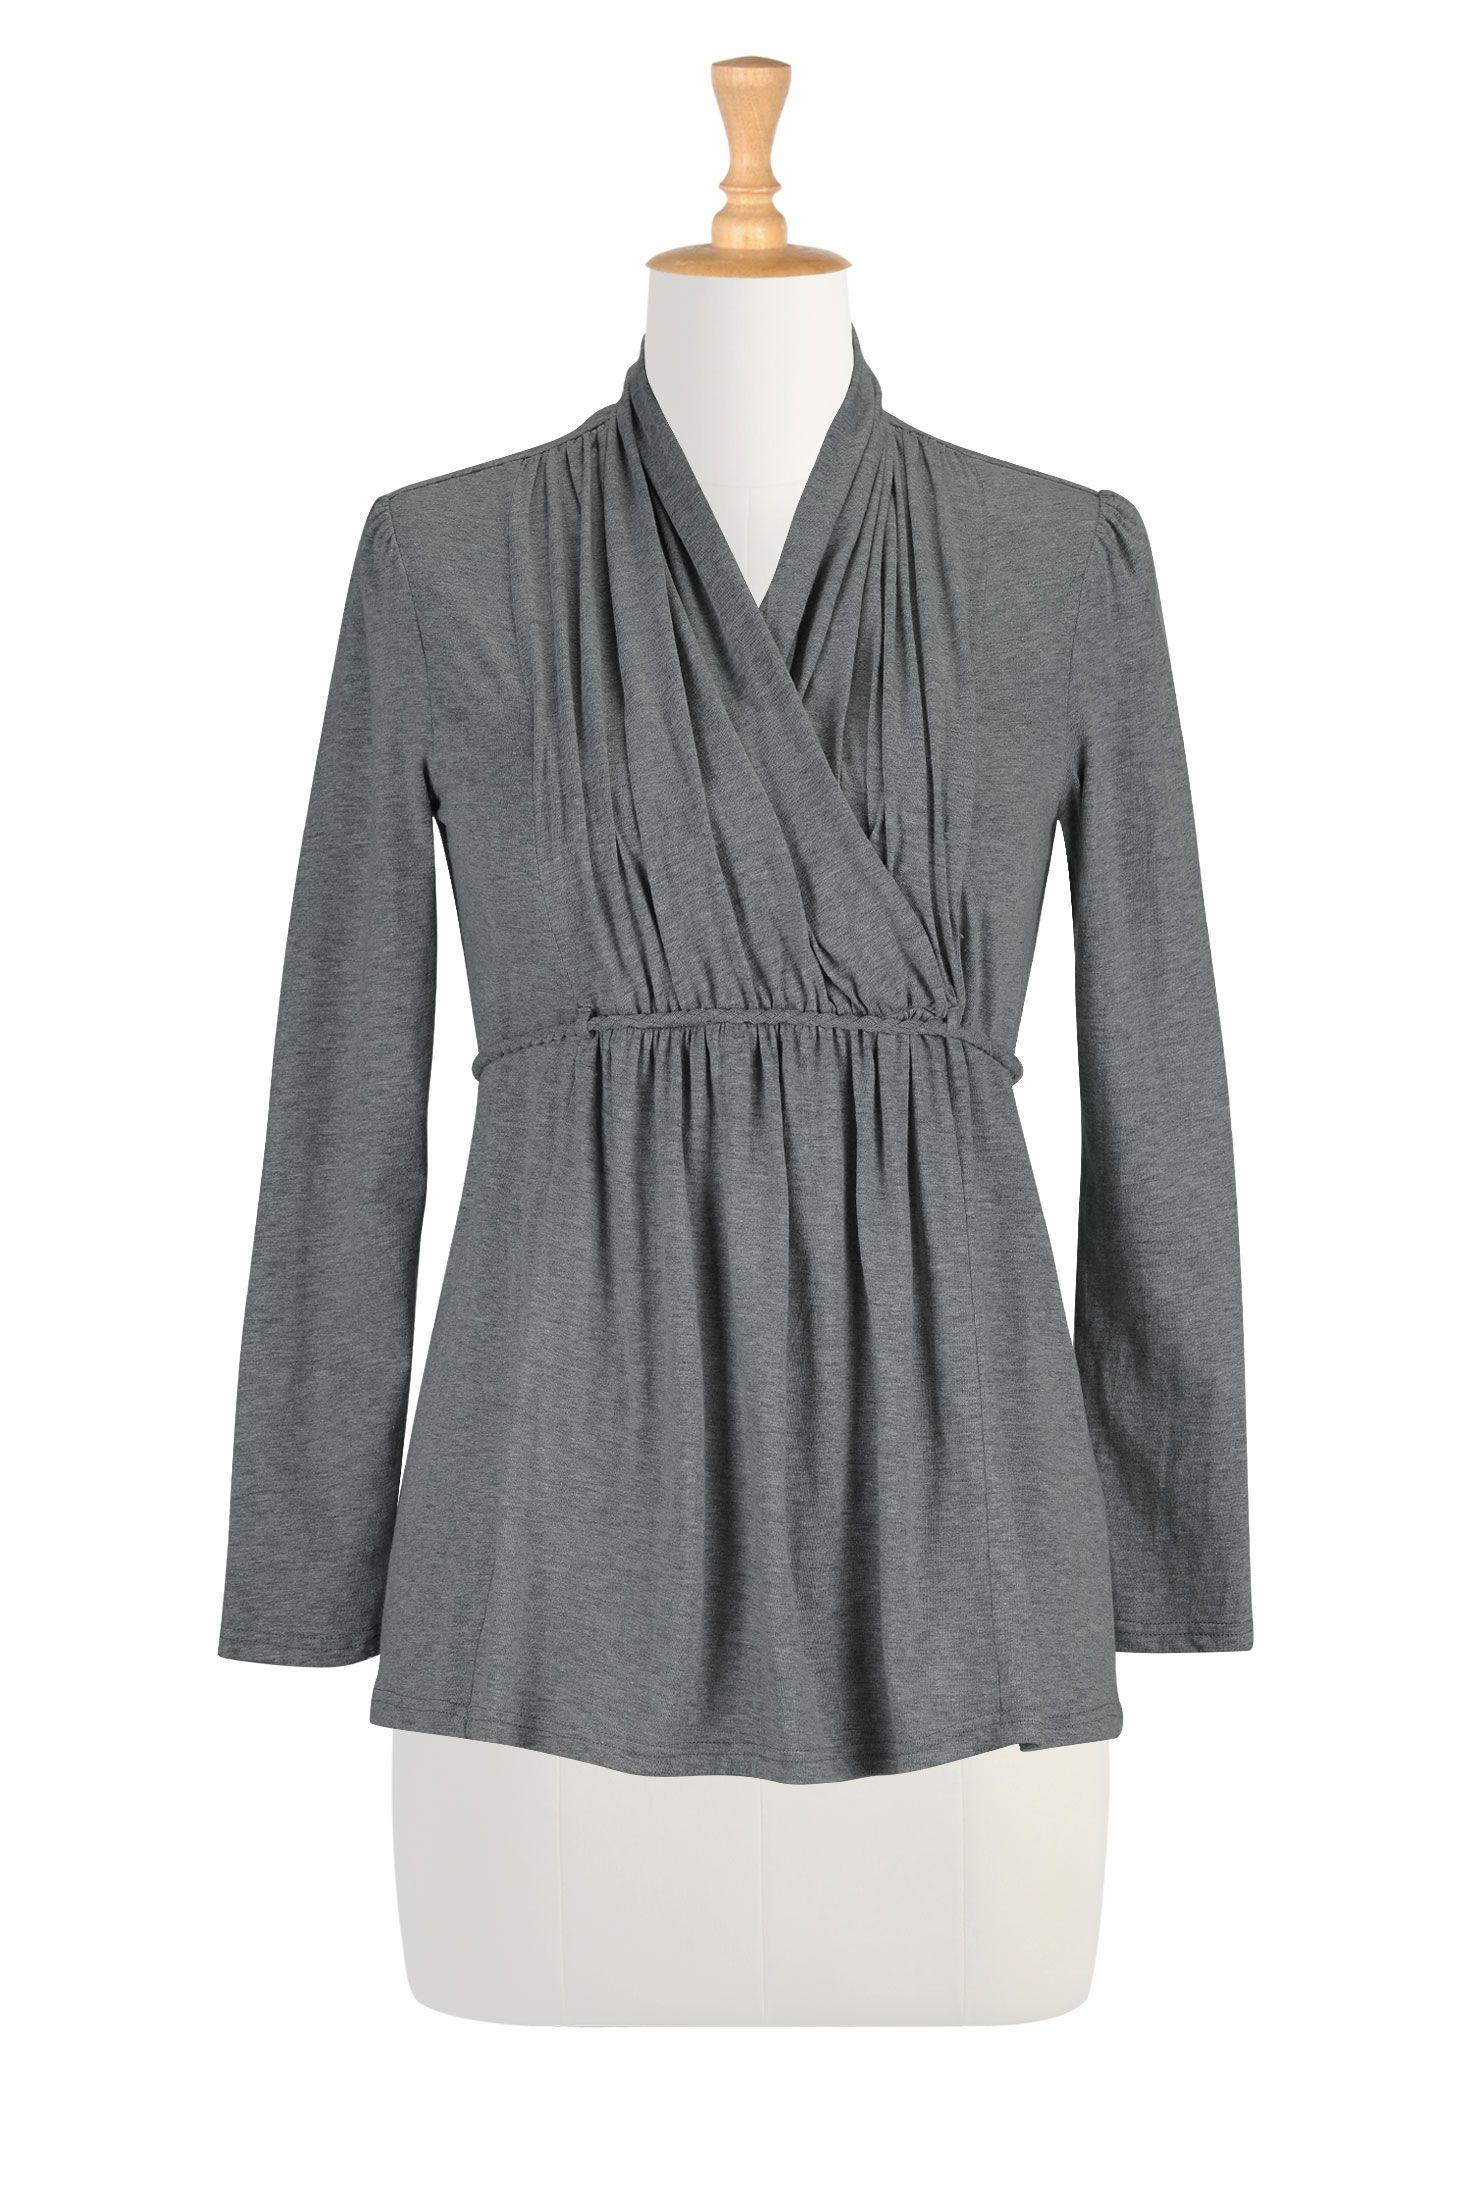 b840b1b3667 Womens designer clothes - Embellished Tops